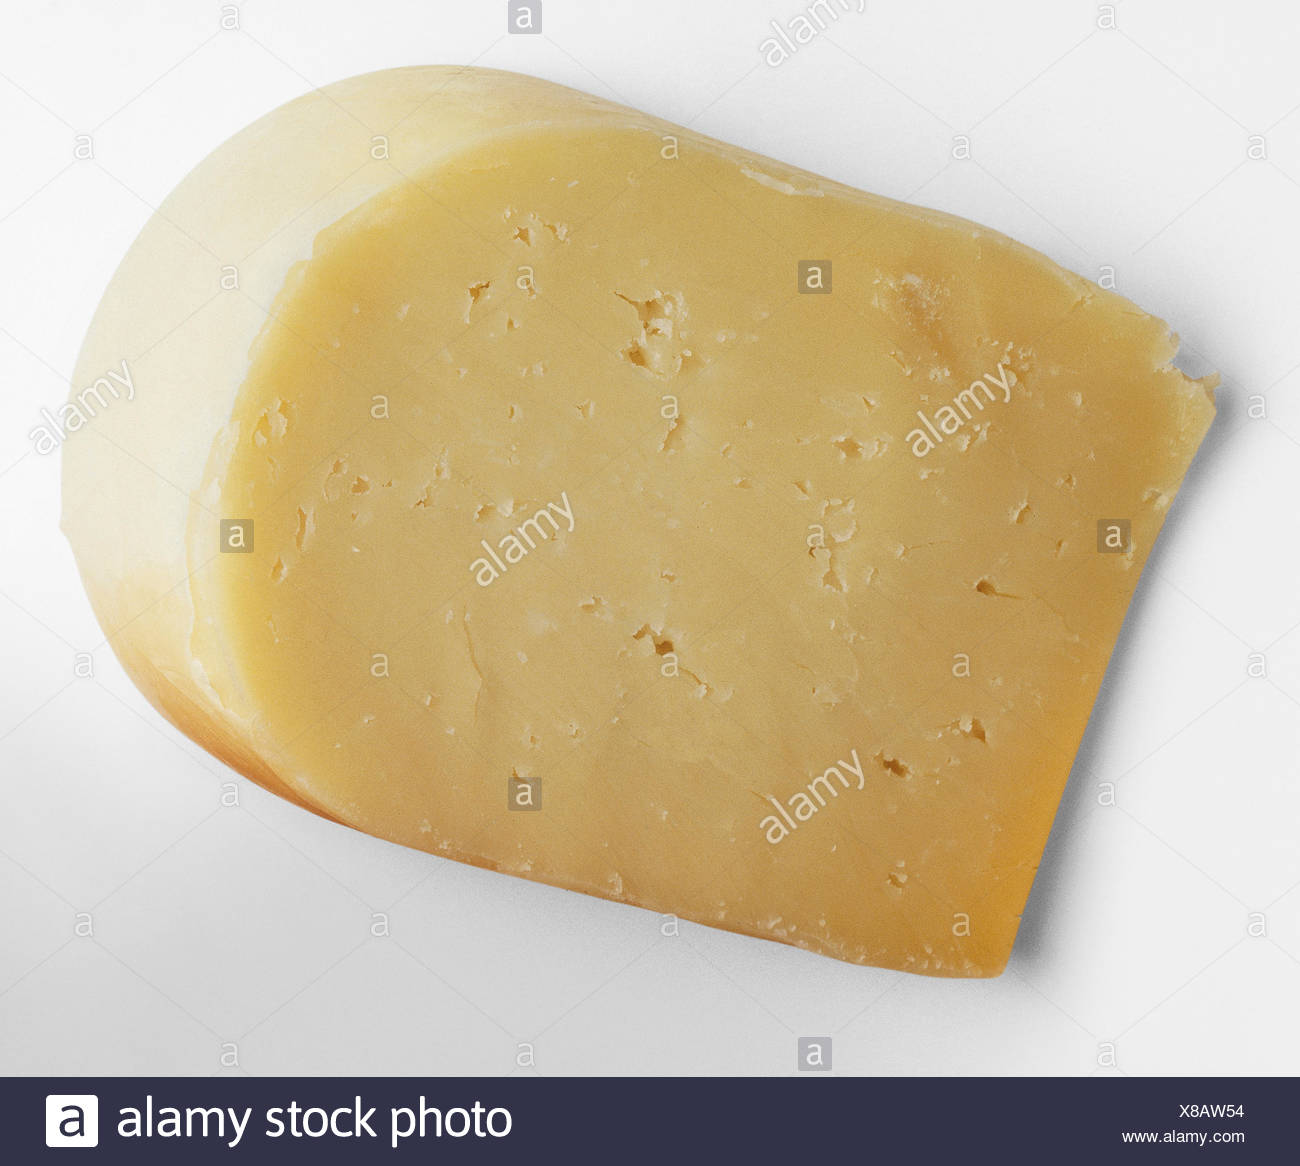 A slice of Monterey jack cheese Stock Photo: 280522400 - Alamy